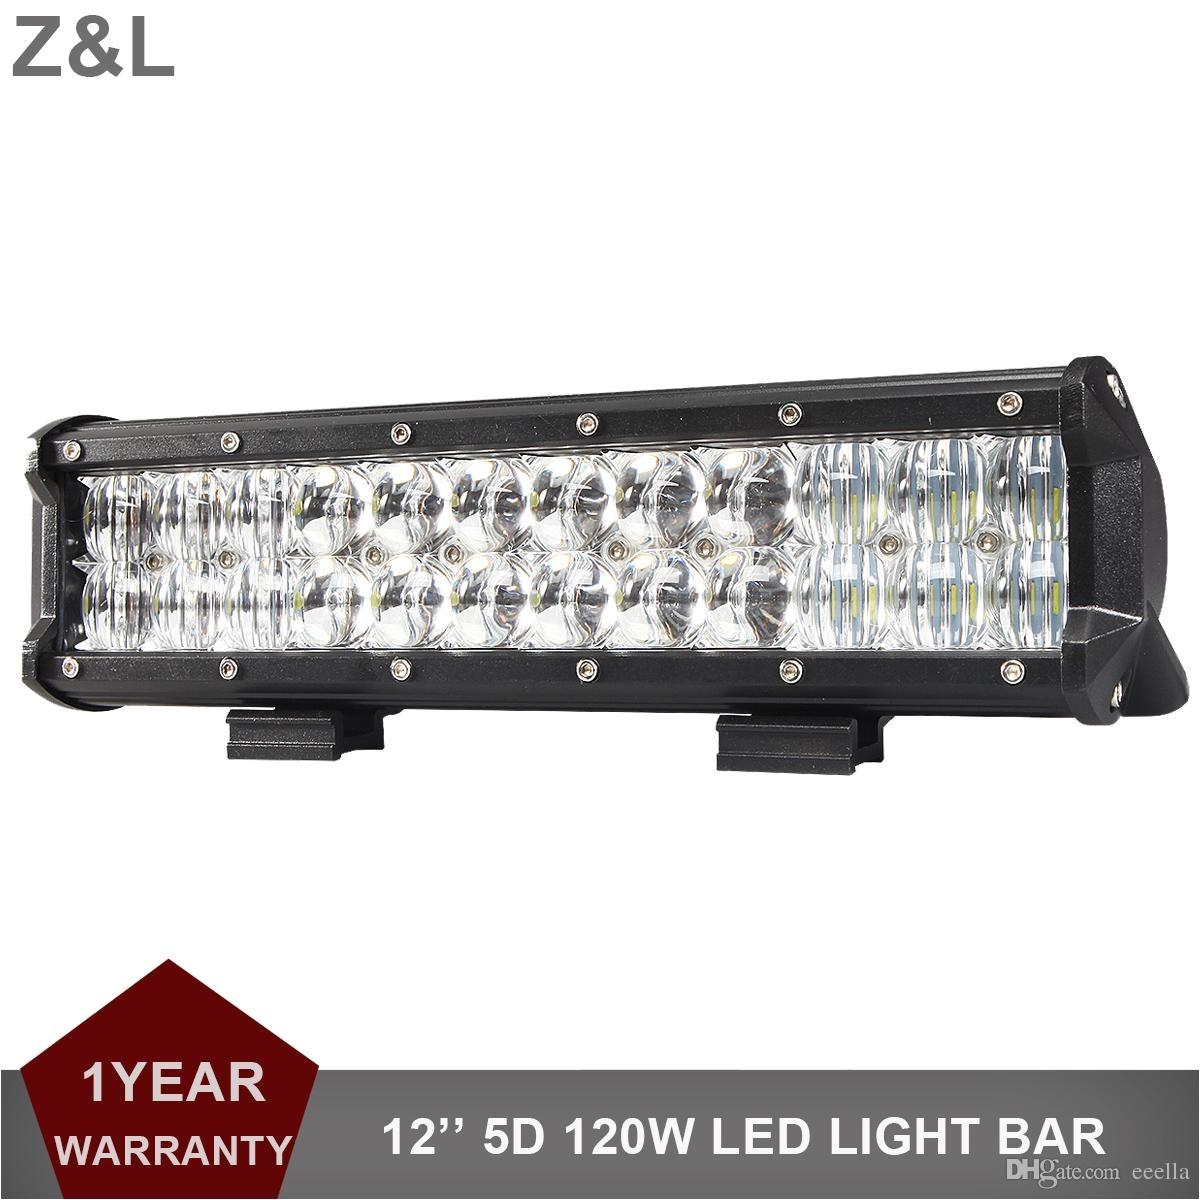 Marine Light Bars 5d 120w Offroad Led Light Bar 12 Inch Combo Car Suv Boat atv 4×4 4wd